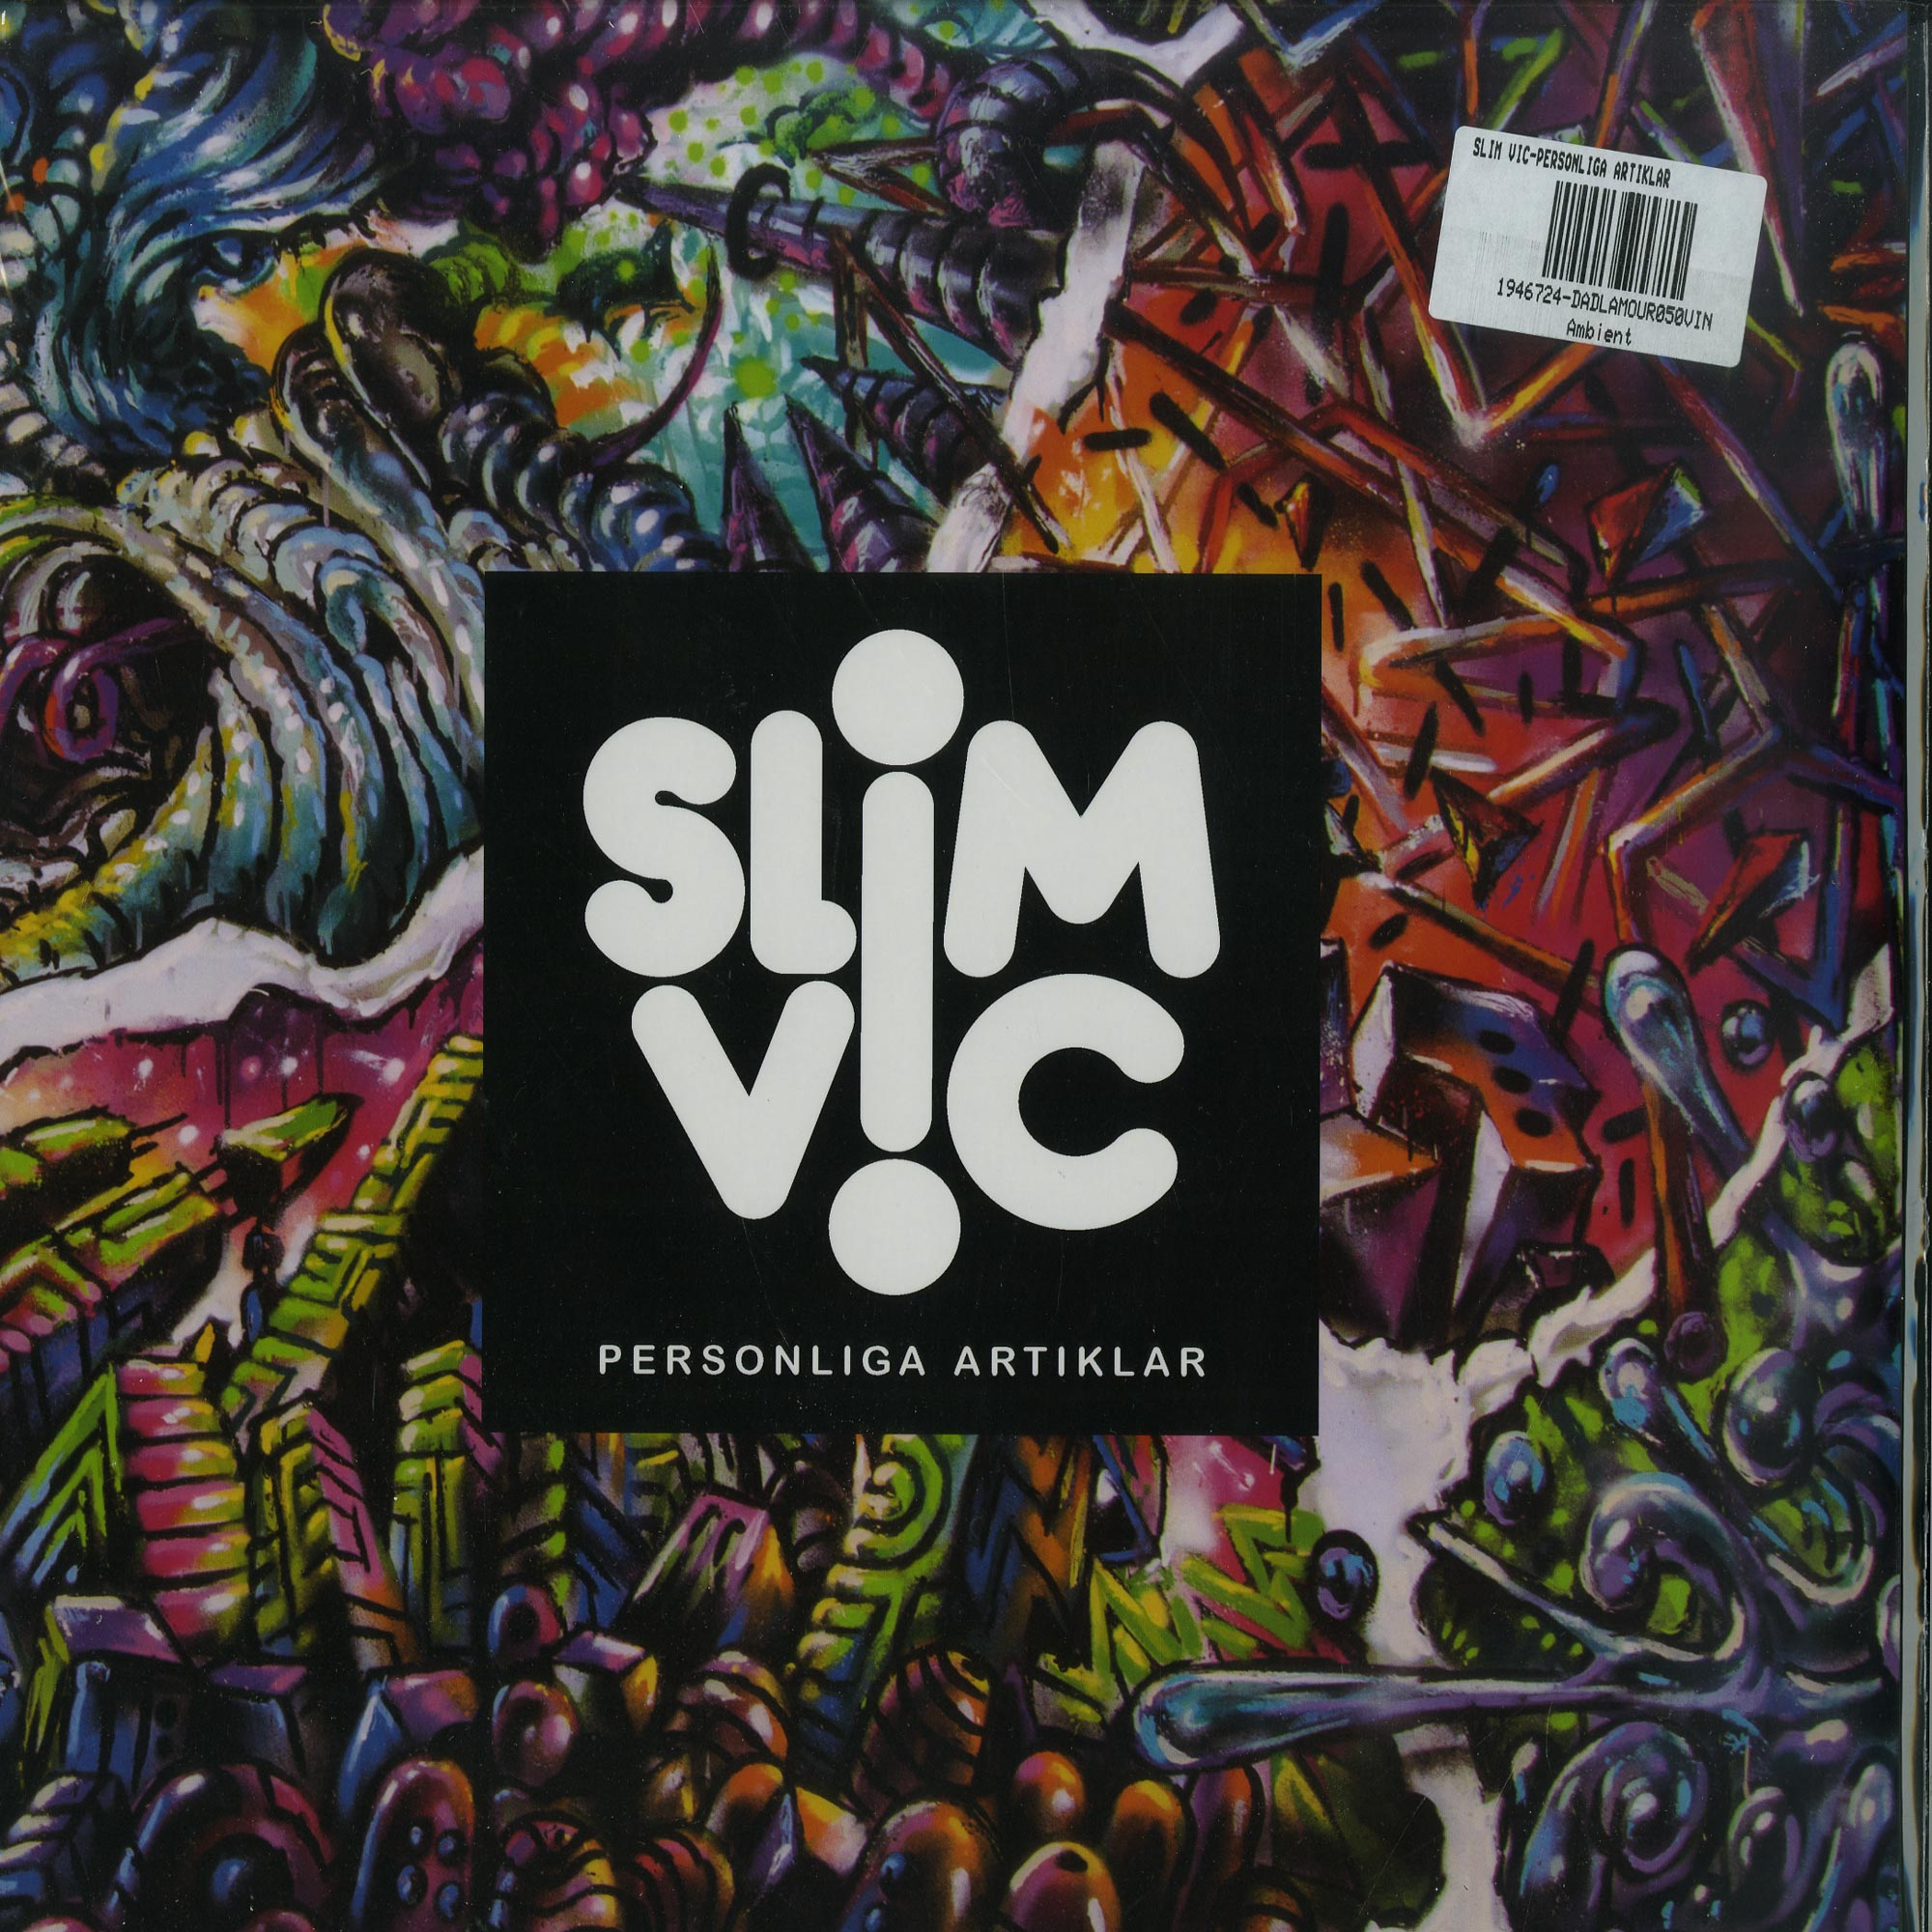 Slim Vic - PERSONLIGA ARTIKLAR